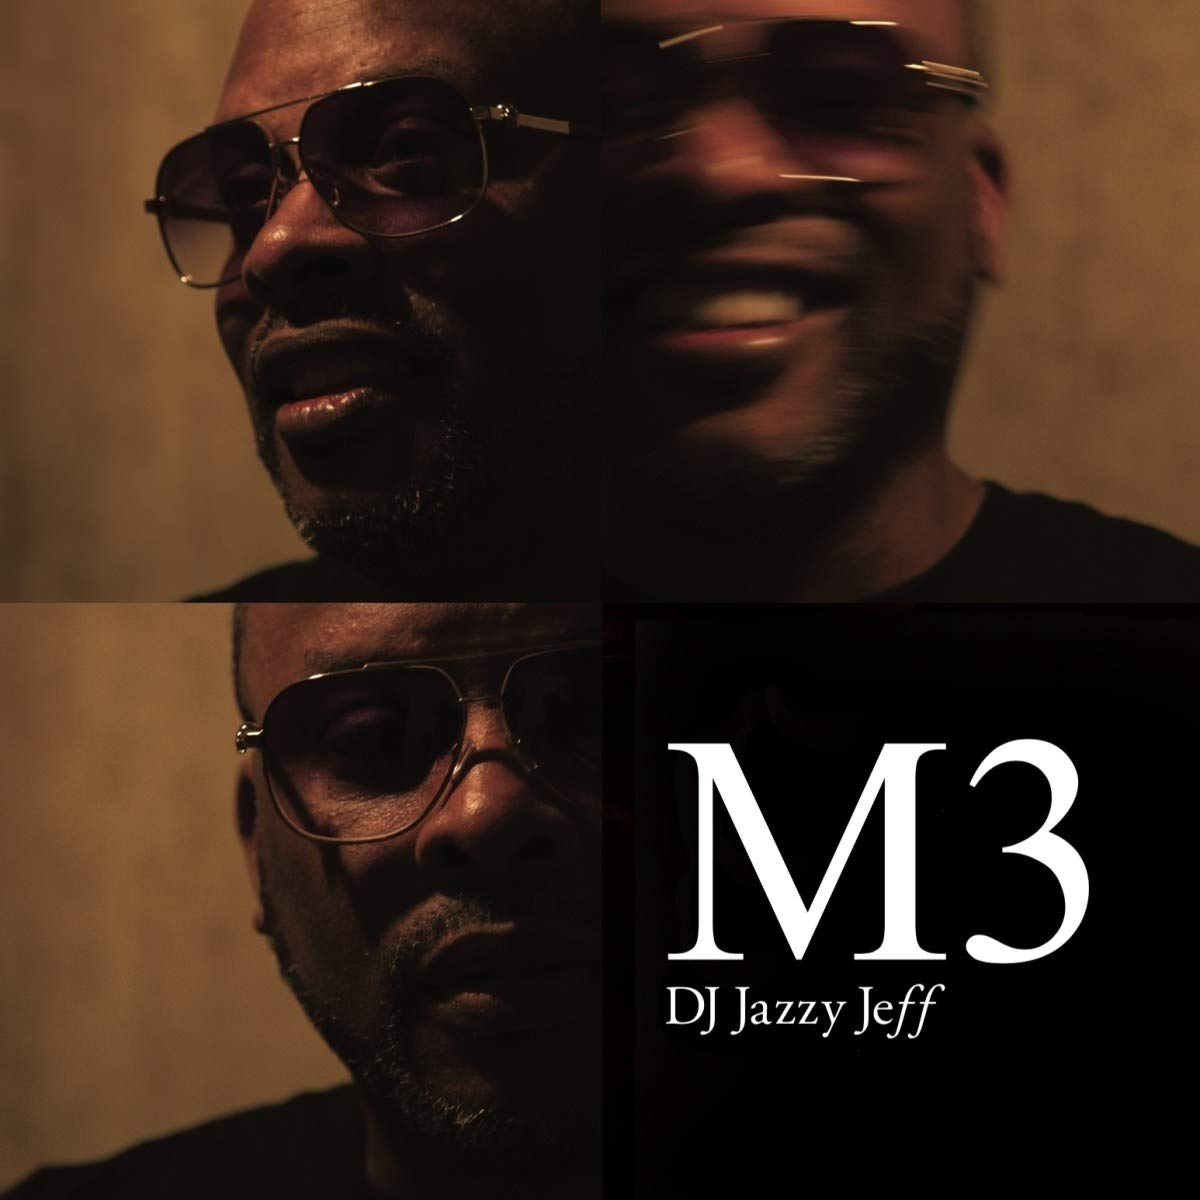 Vinilo : DJ Jazzy Jeff - M3 (2 Pack)